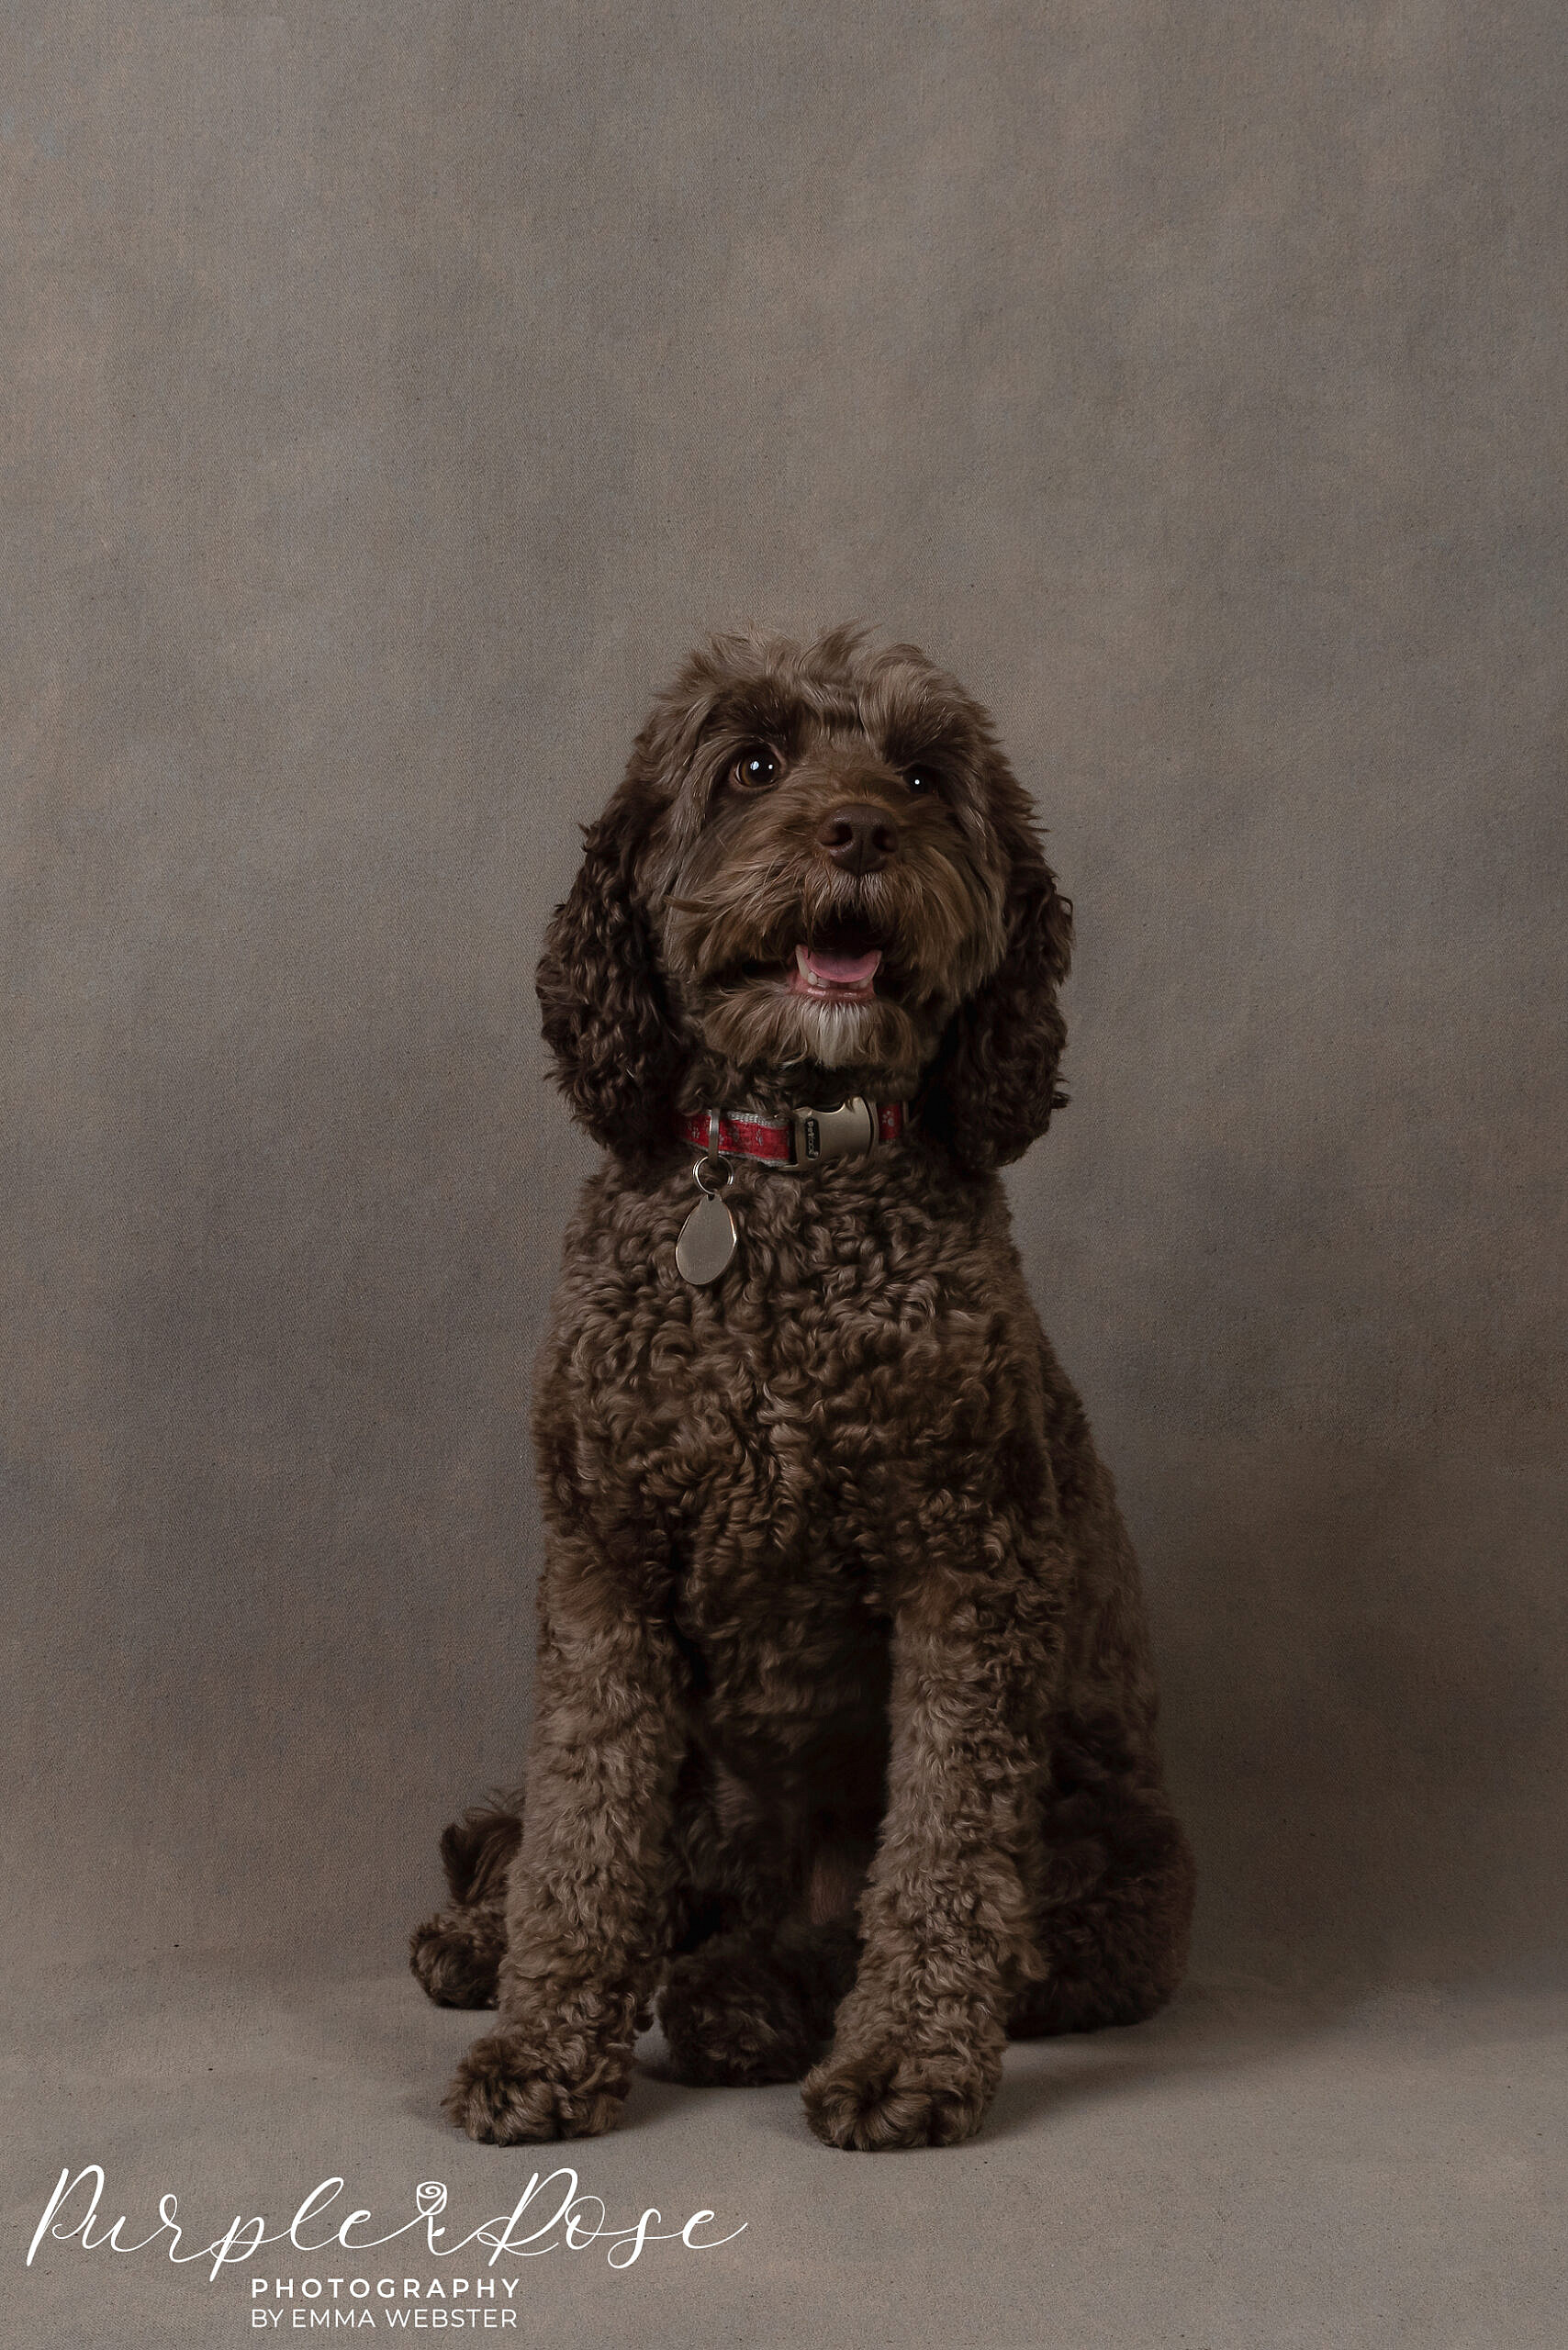 Dog in a photo studio